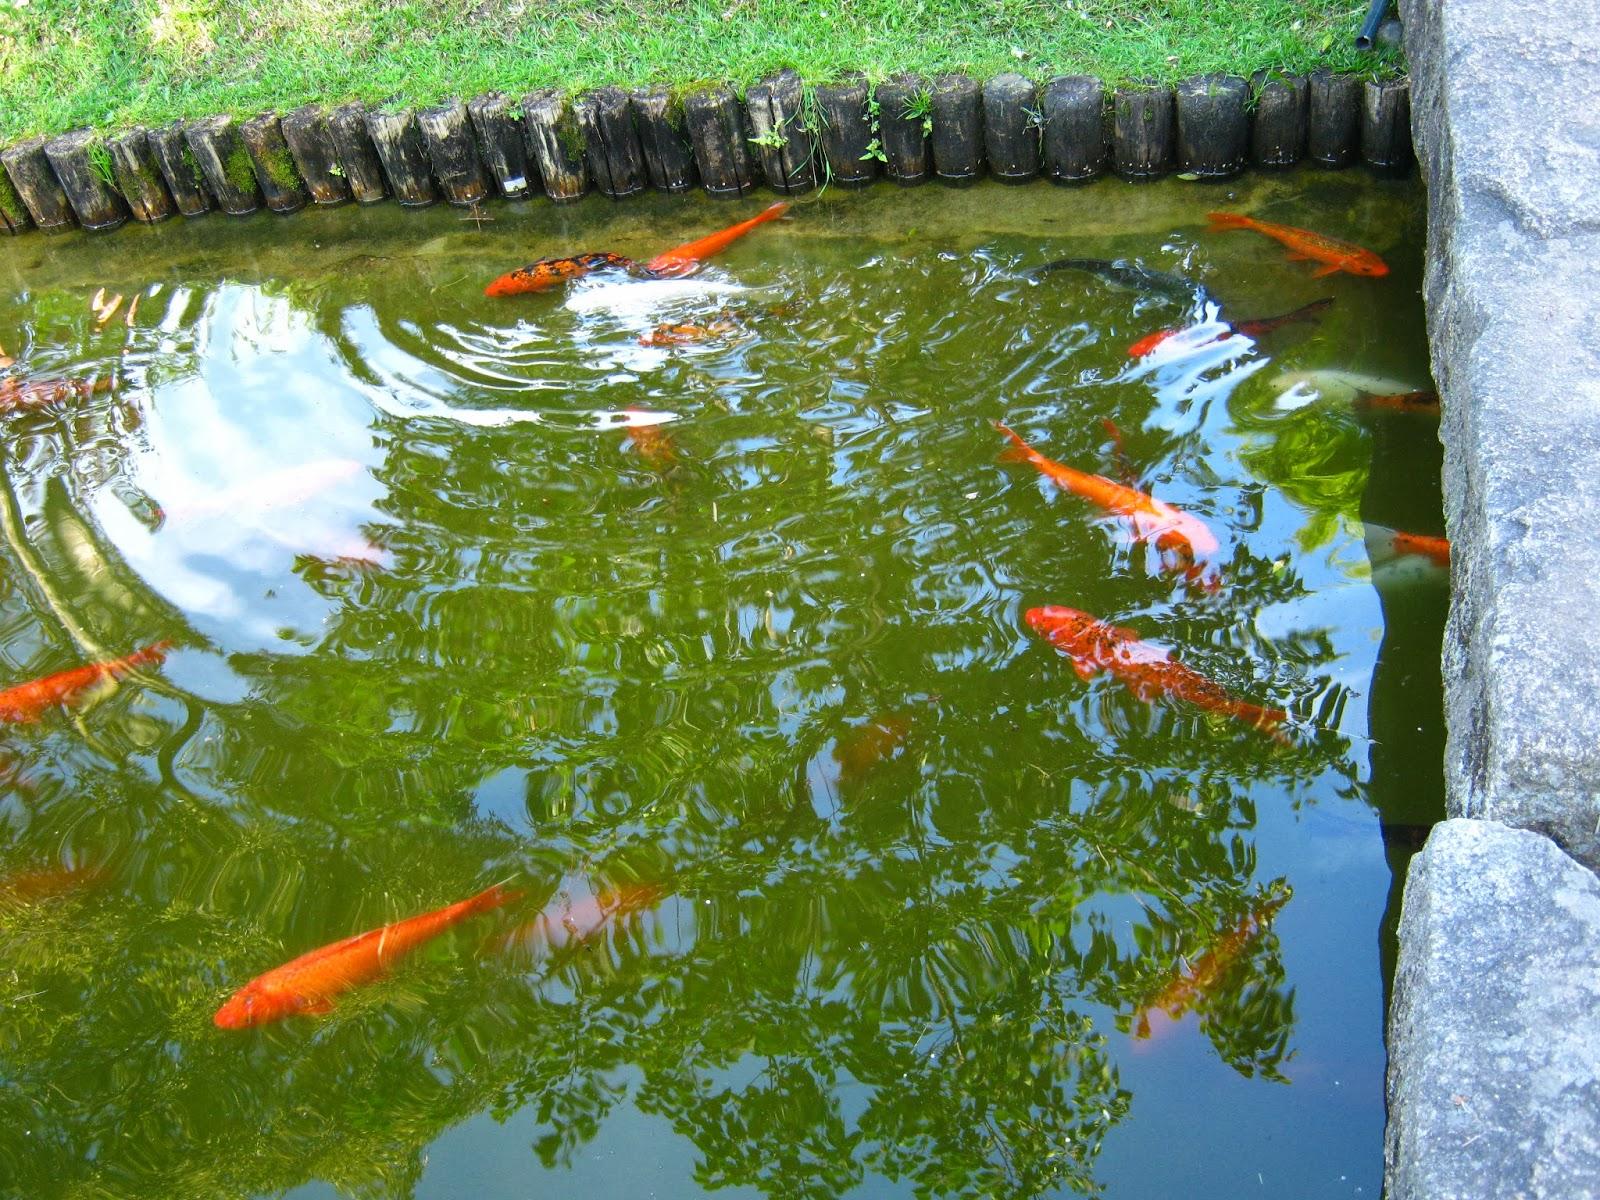 Fotos uruguay jardin japones montevideo for Jardines pequenos tipo japones